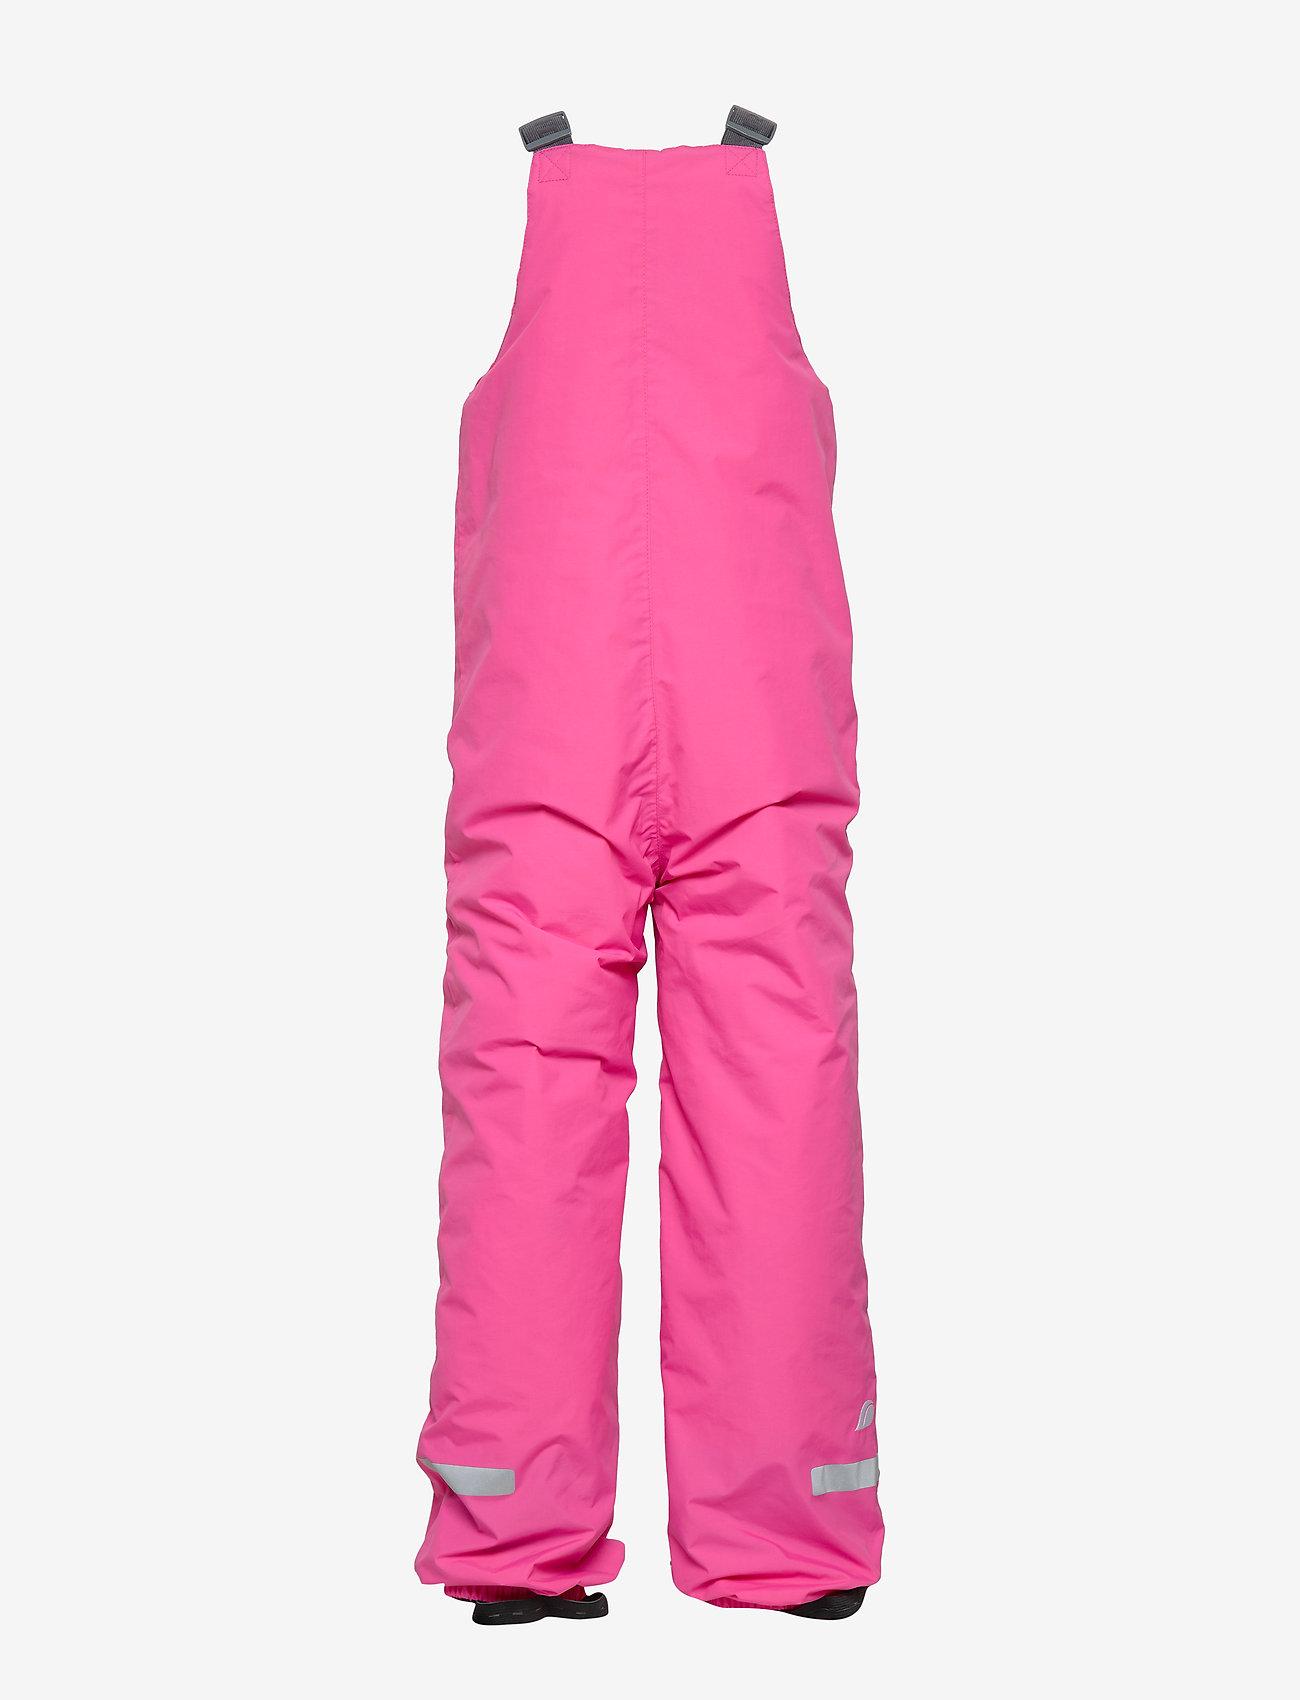 Didriksons - TARFALA KIDS PANTS 3 - schneehose - plastic pink - 1